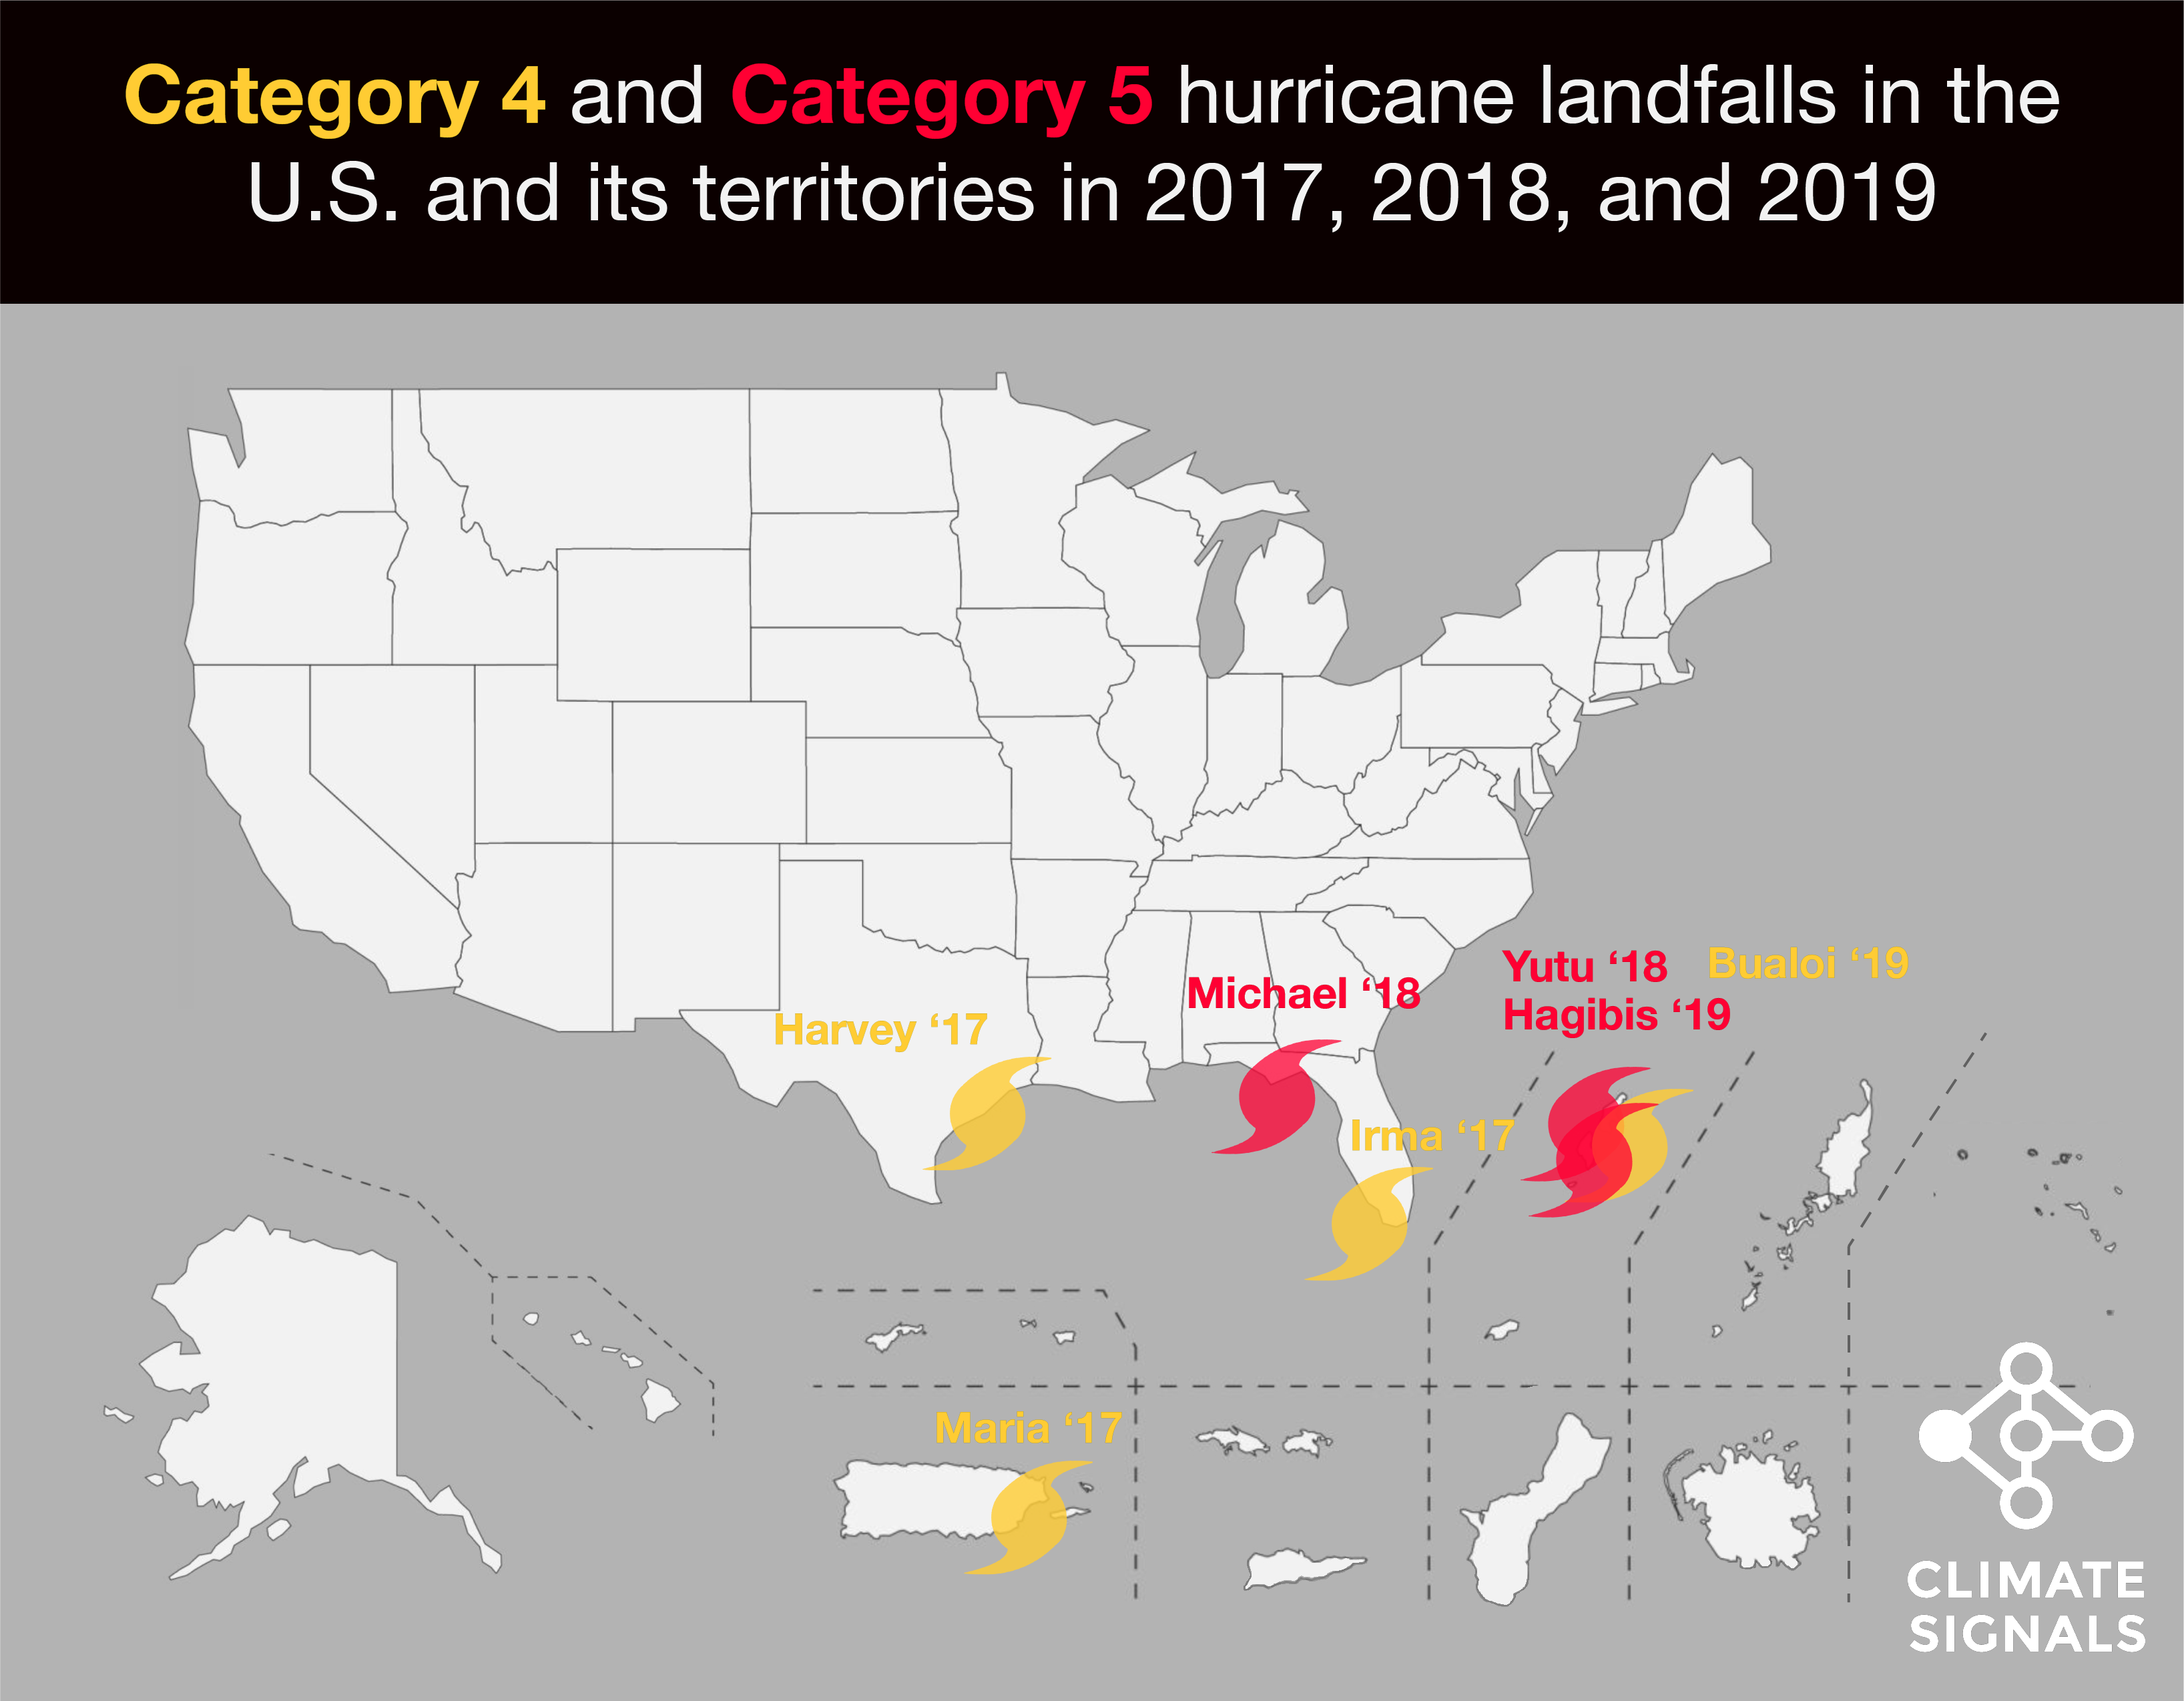 Climate Signals US Hurricane Landfalls